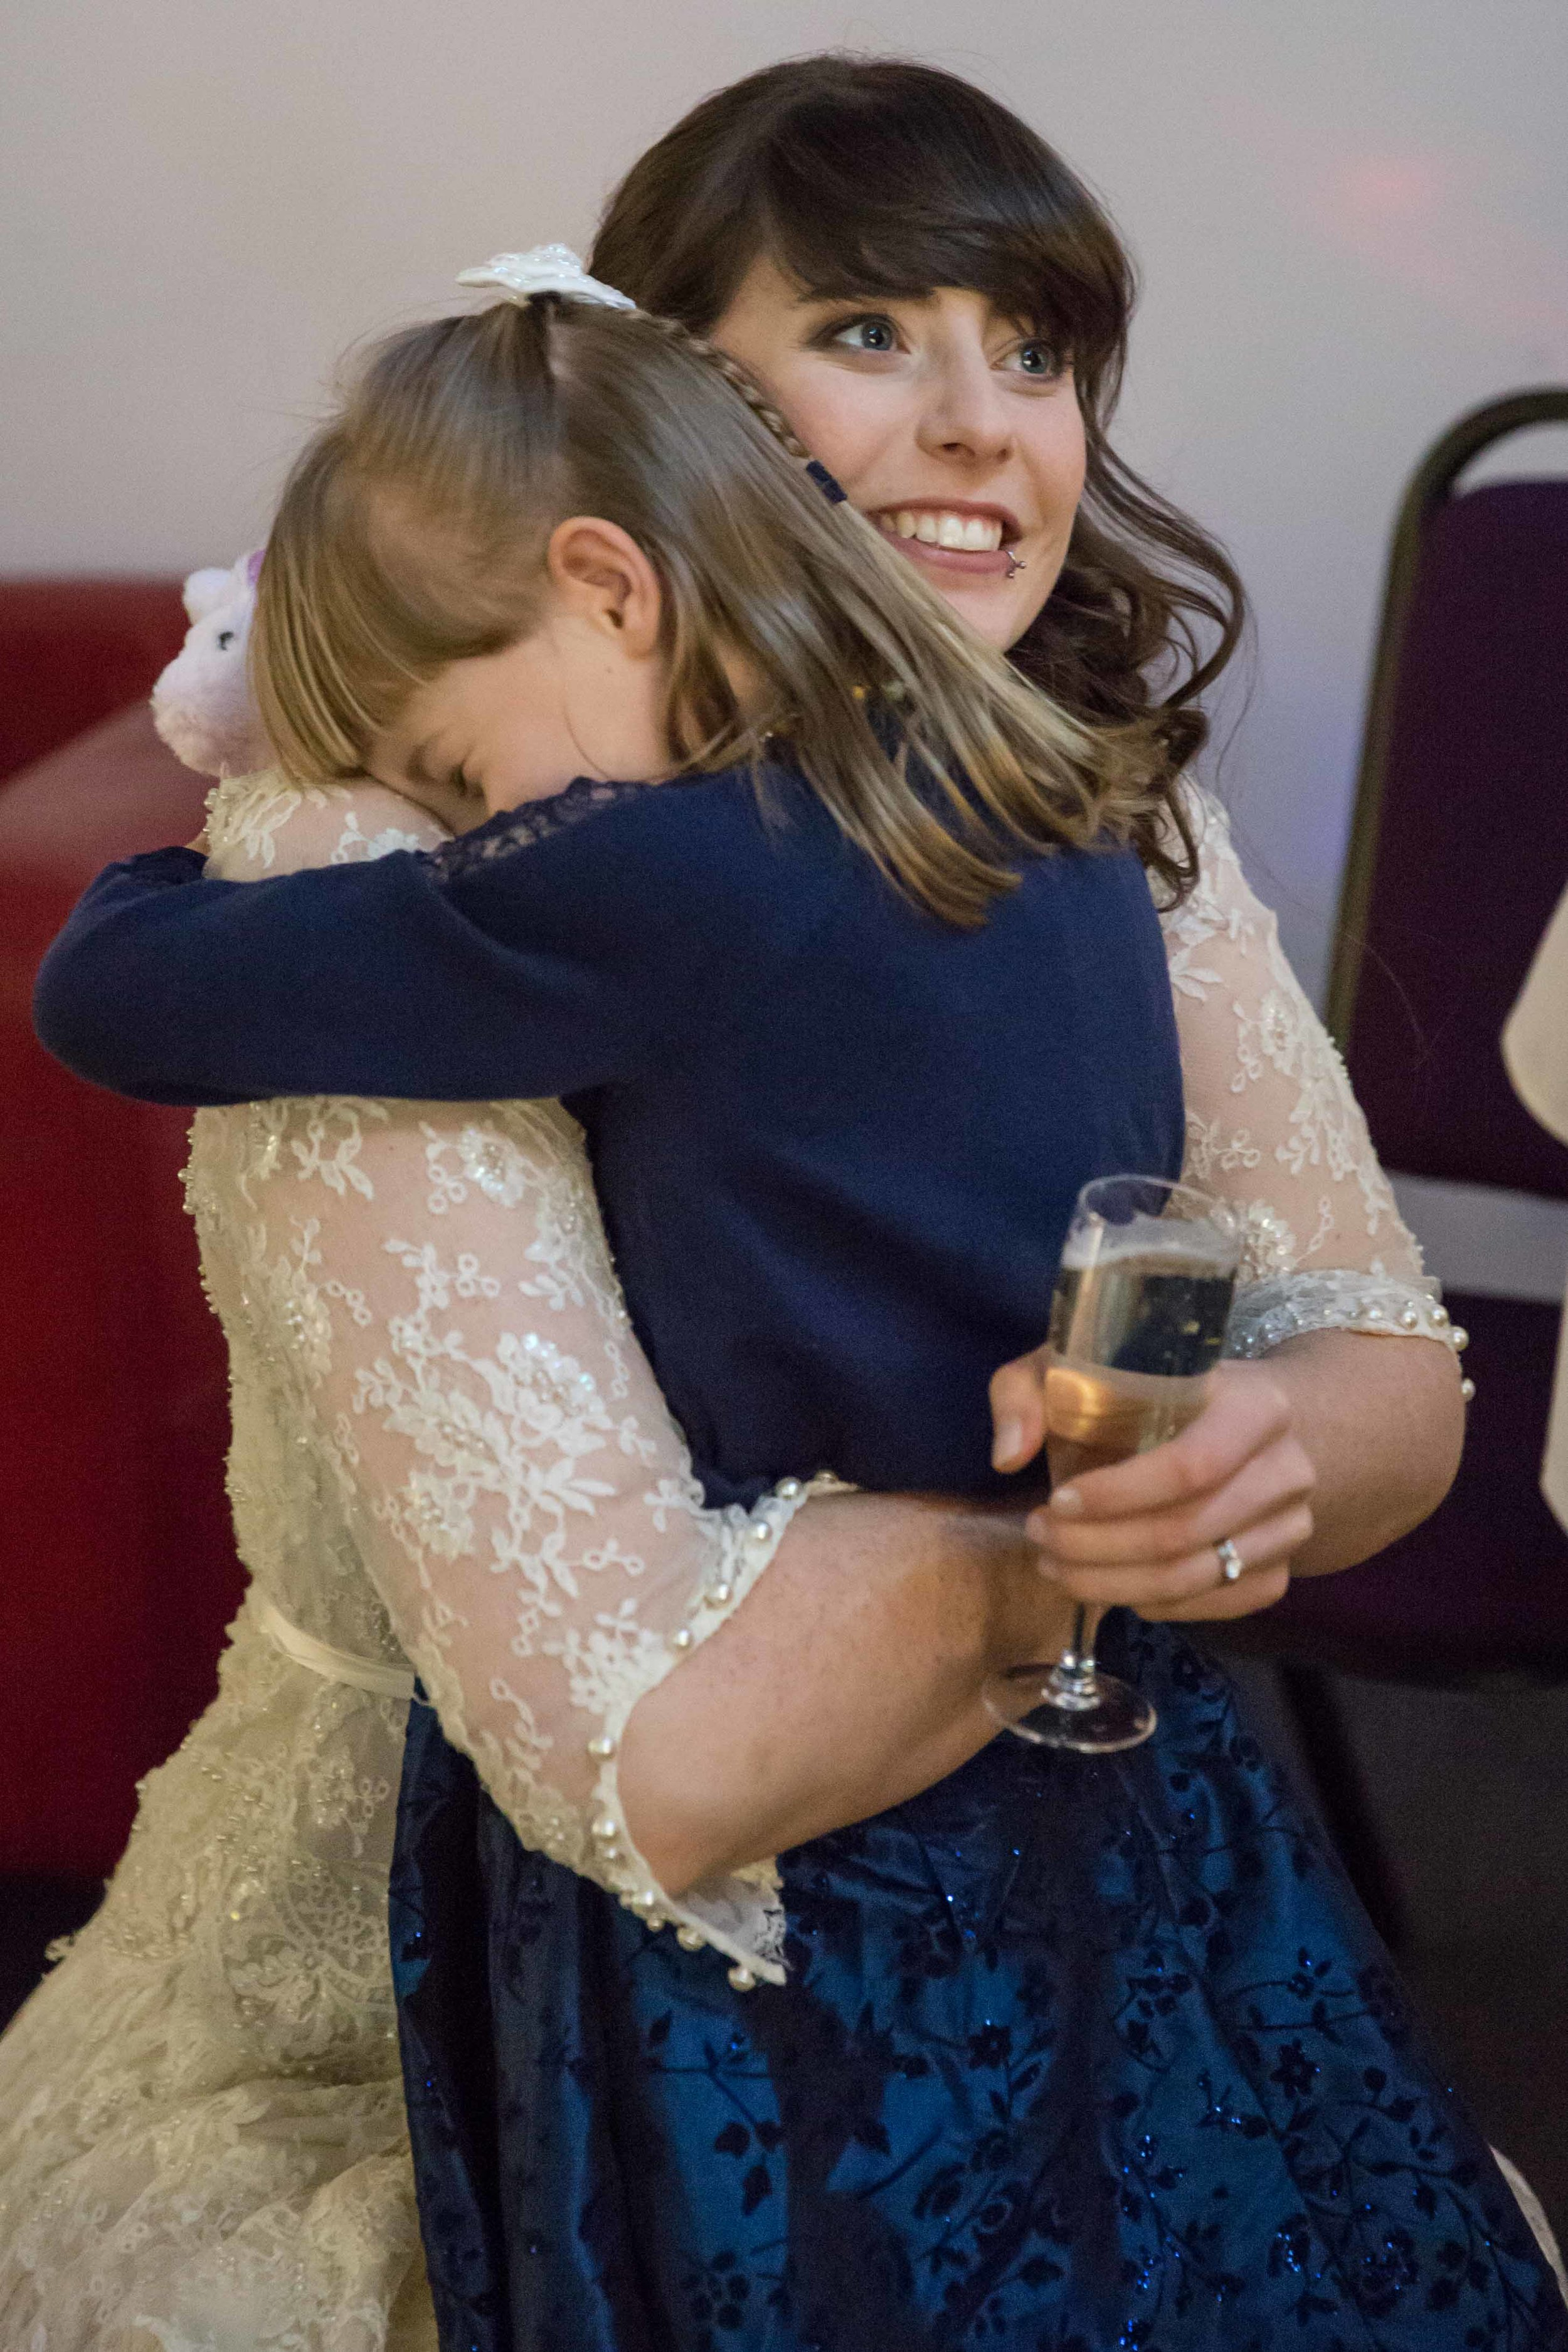 Adam & Faye - Wright Wedding Photography - Bristol Wedding Photographer -160.jpg